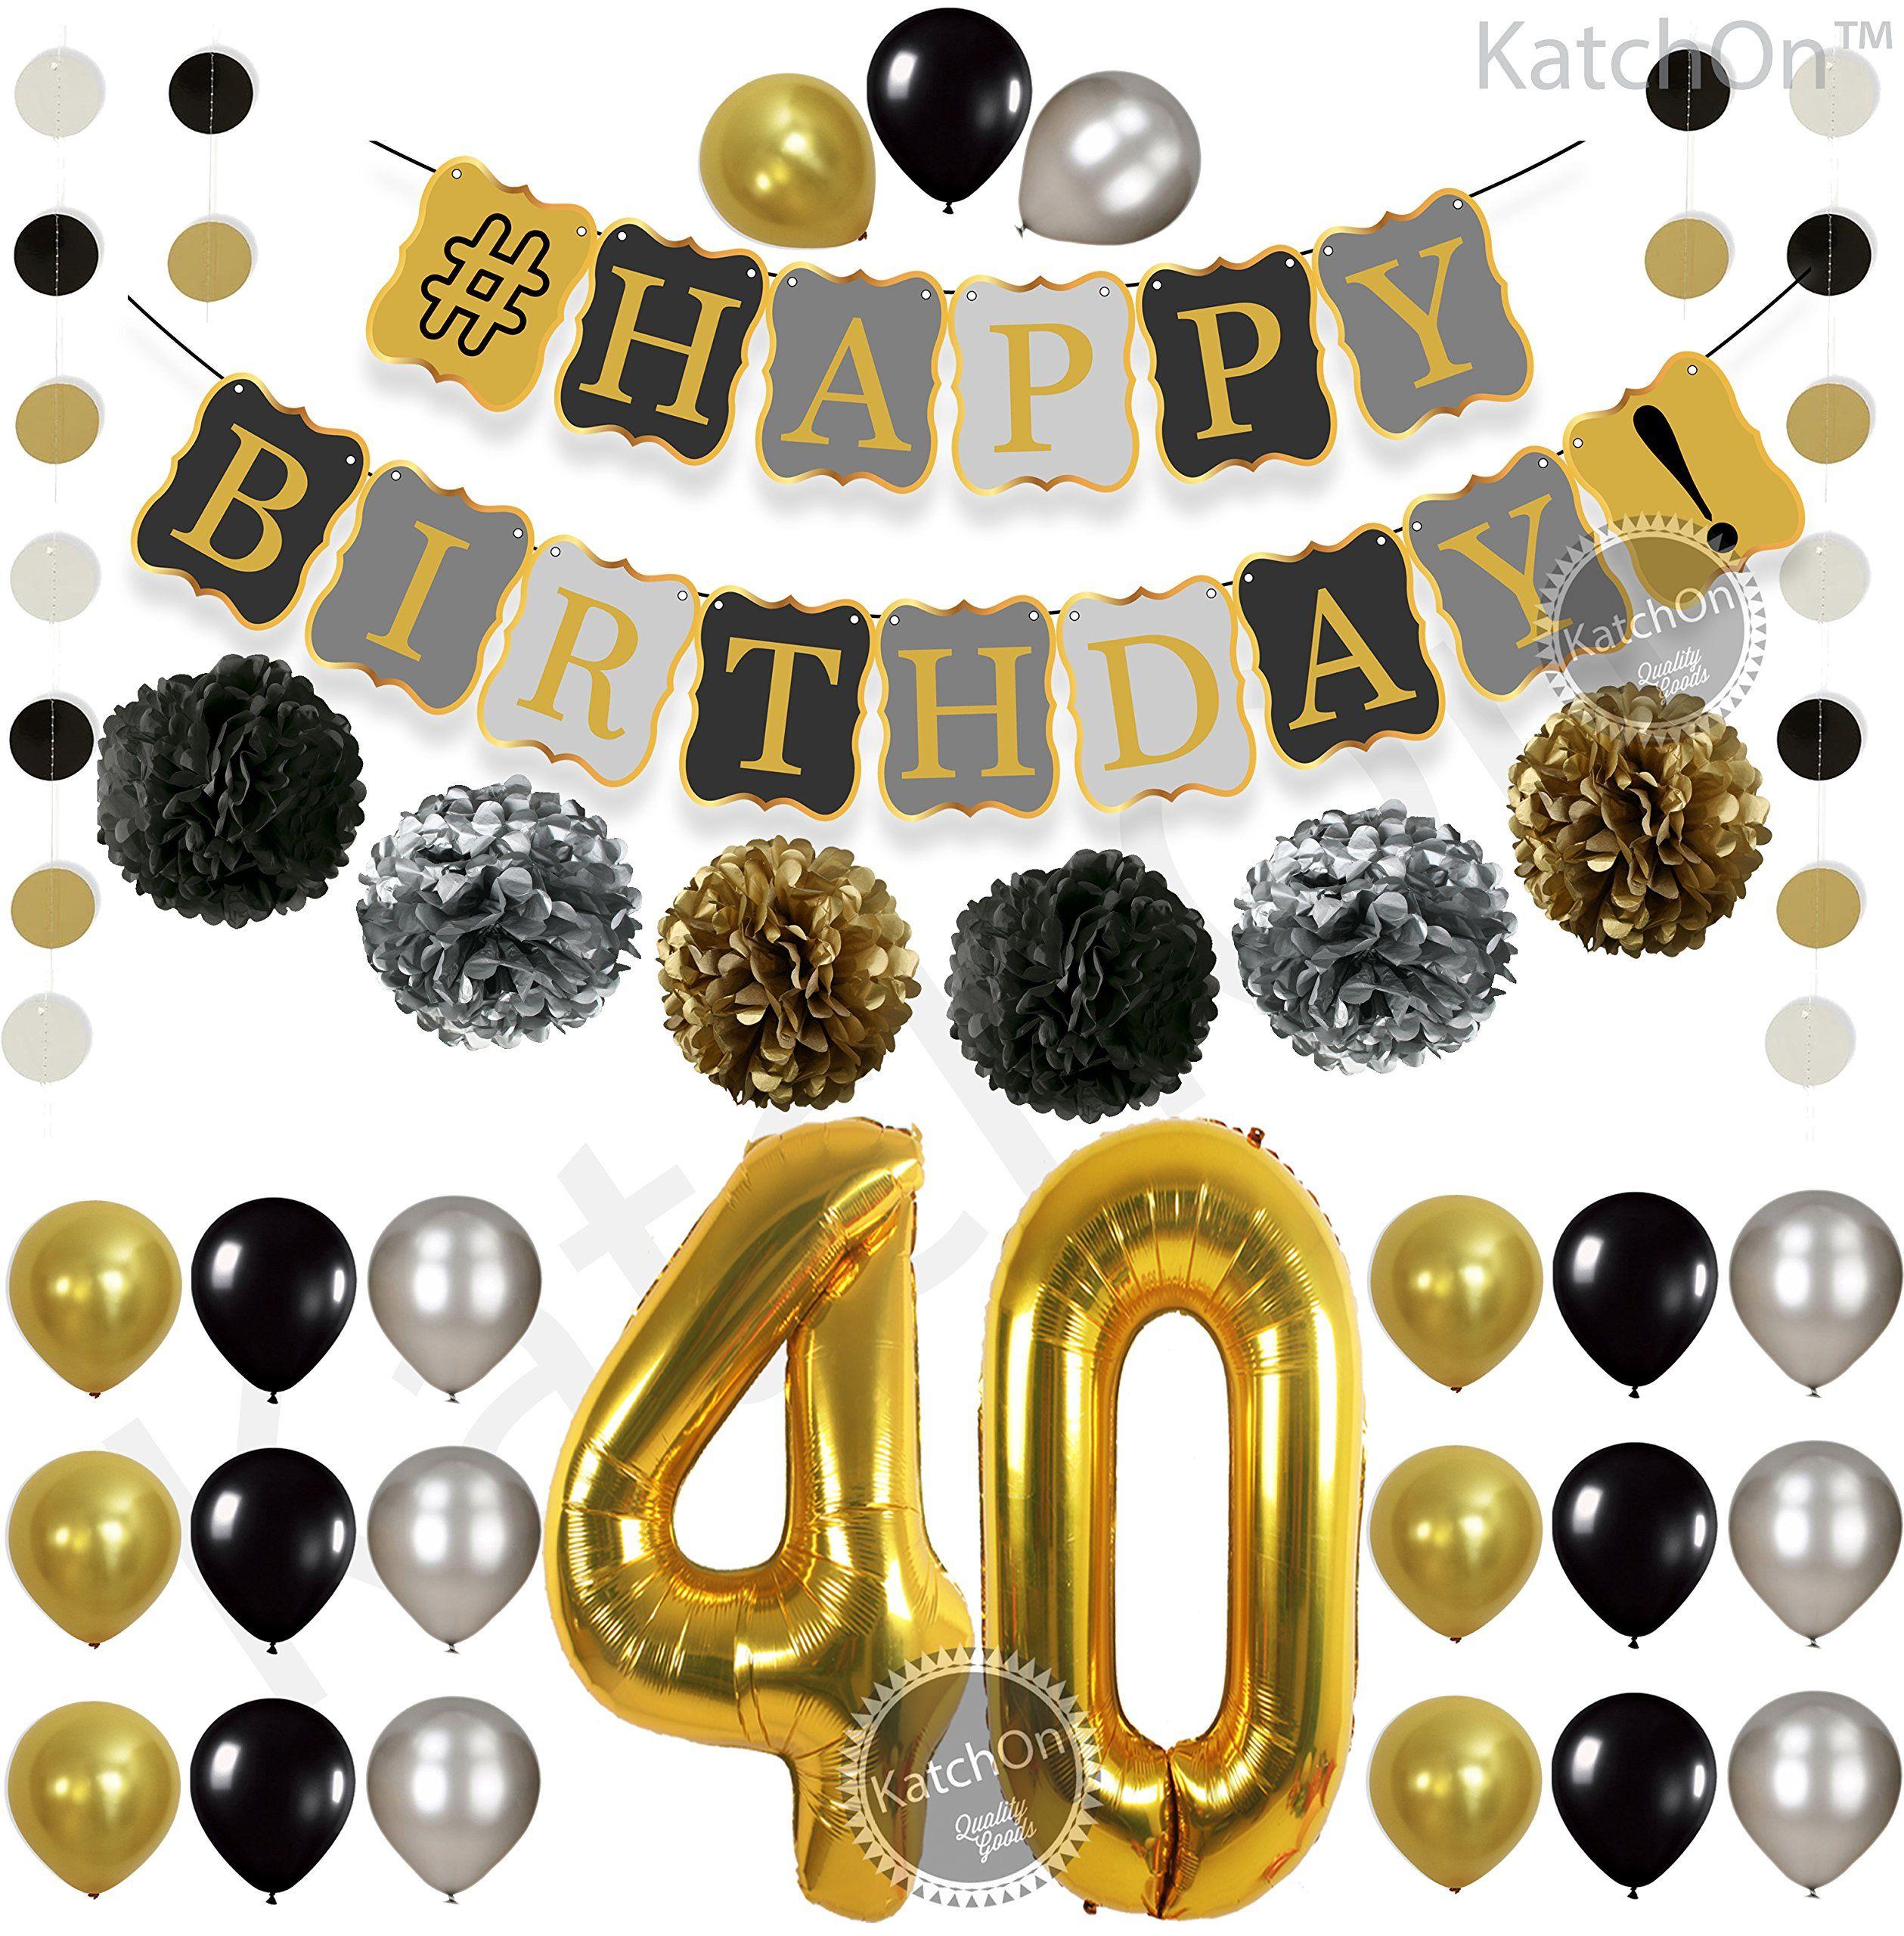 40th BIRTHDAY DECORATIONS BALLOONS BANNER